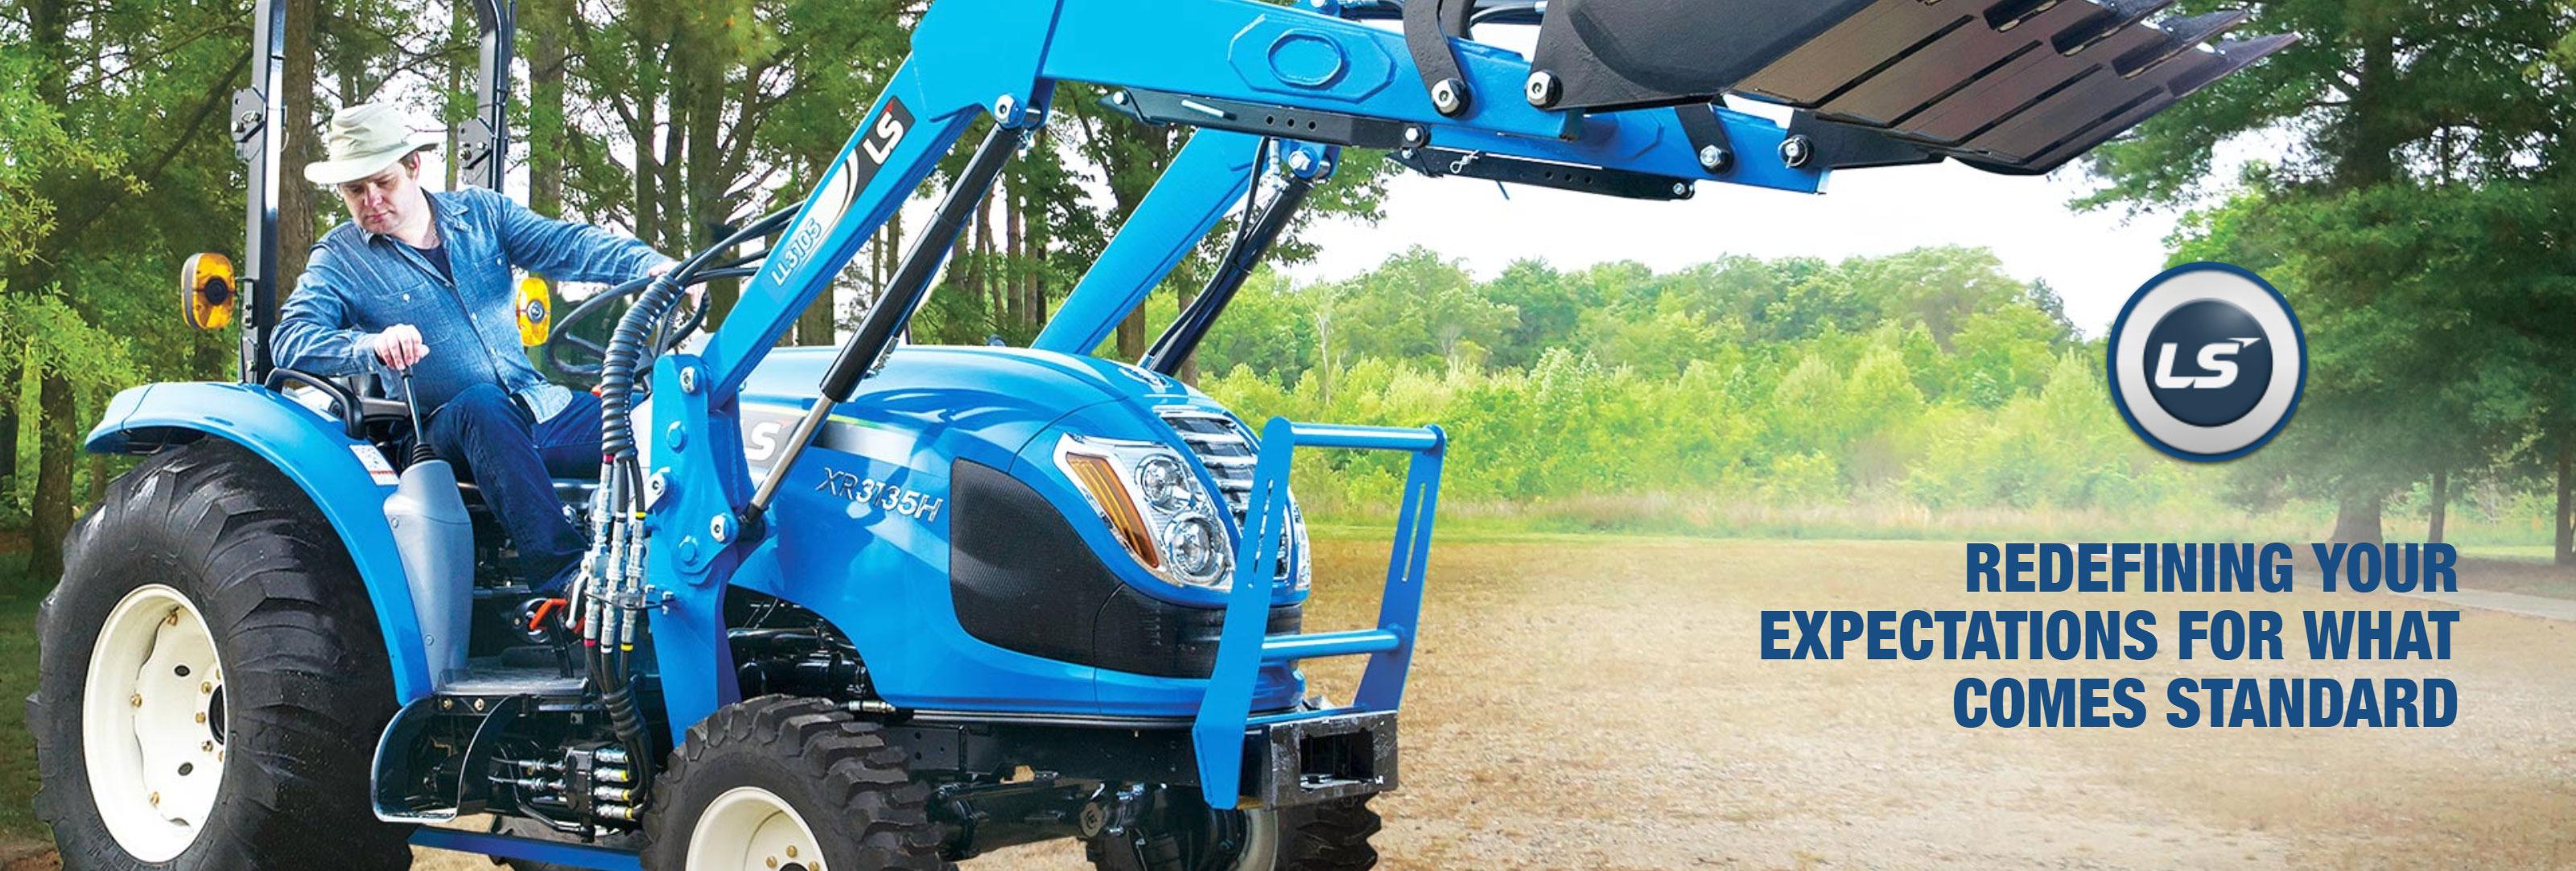 LS Tractors for Sale at Sherlock Equipment